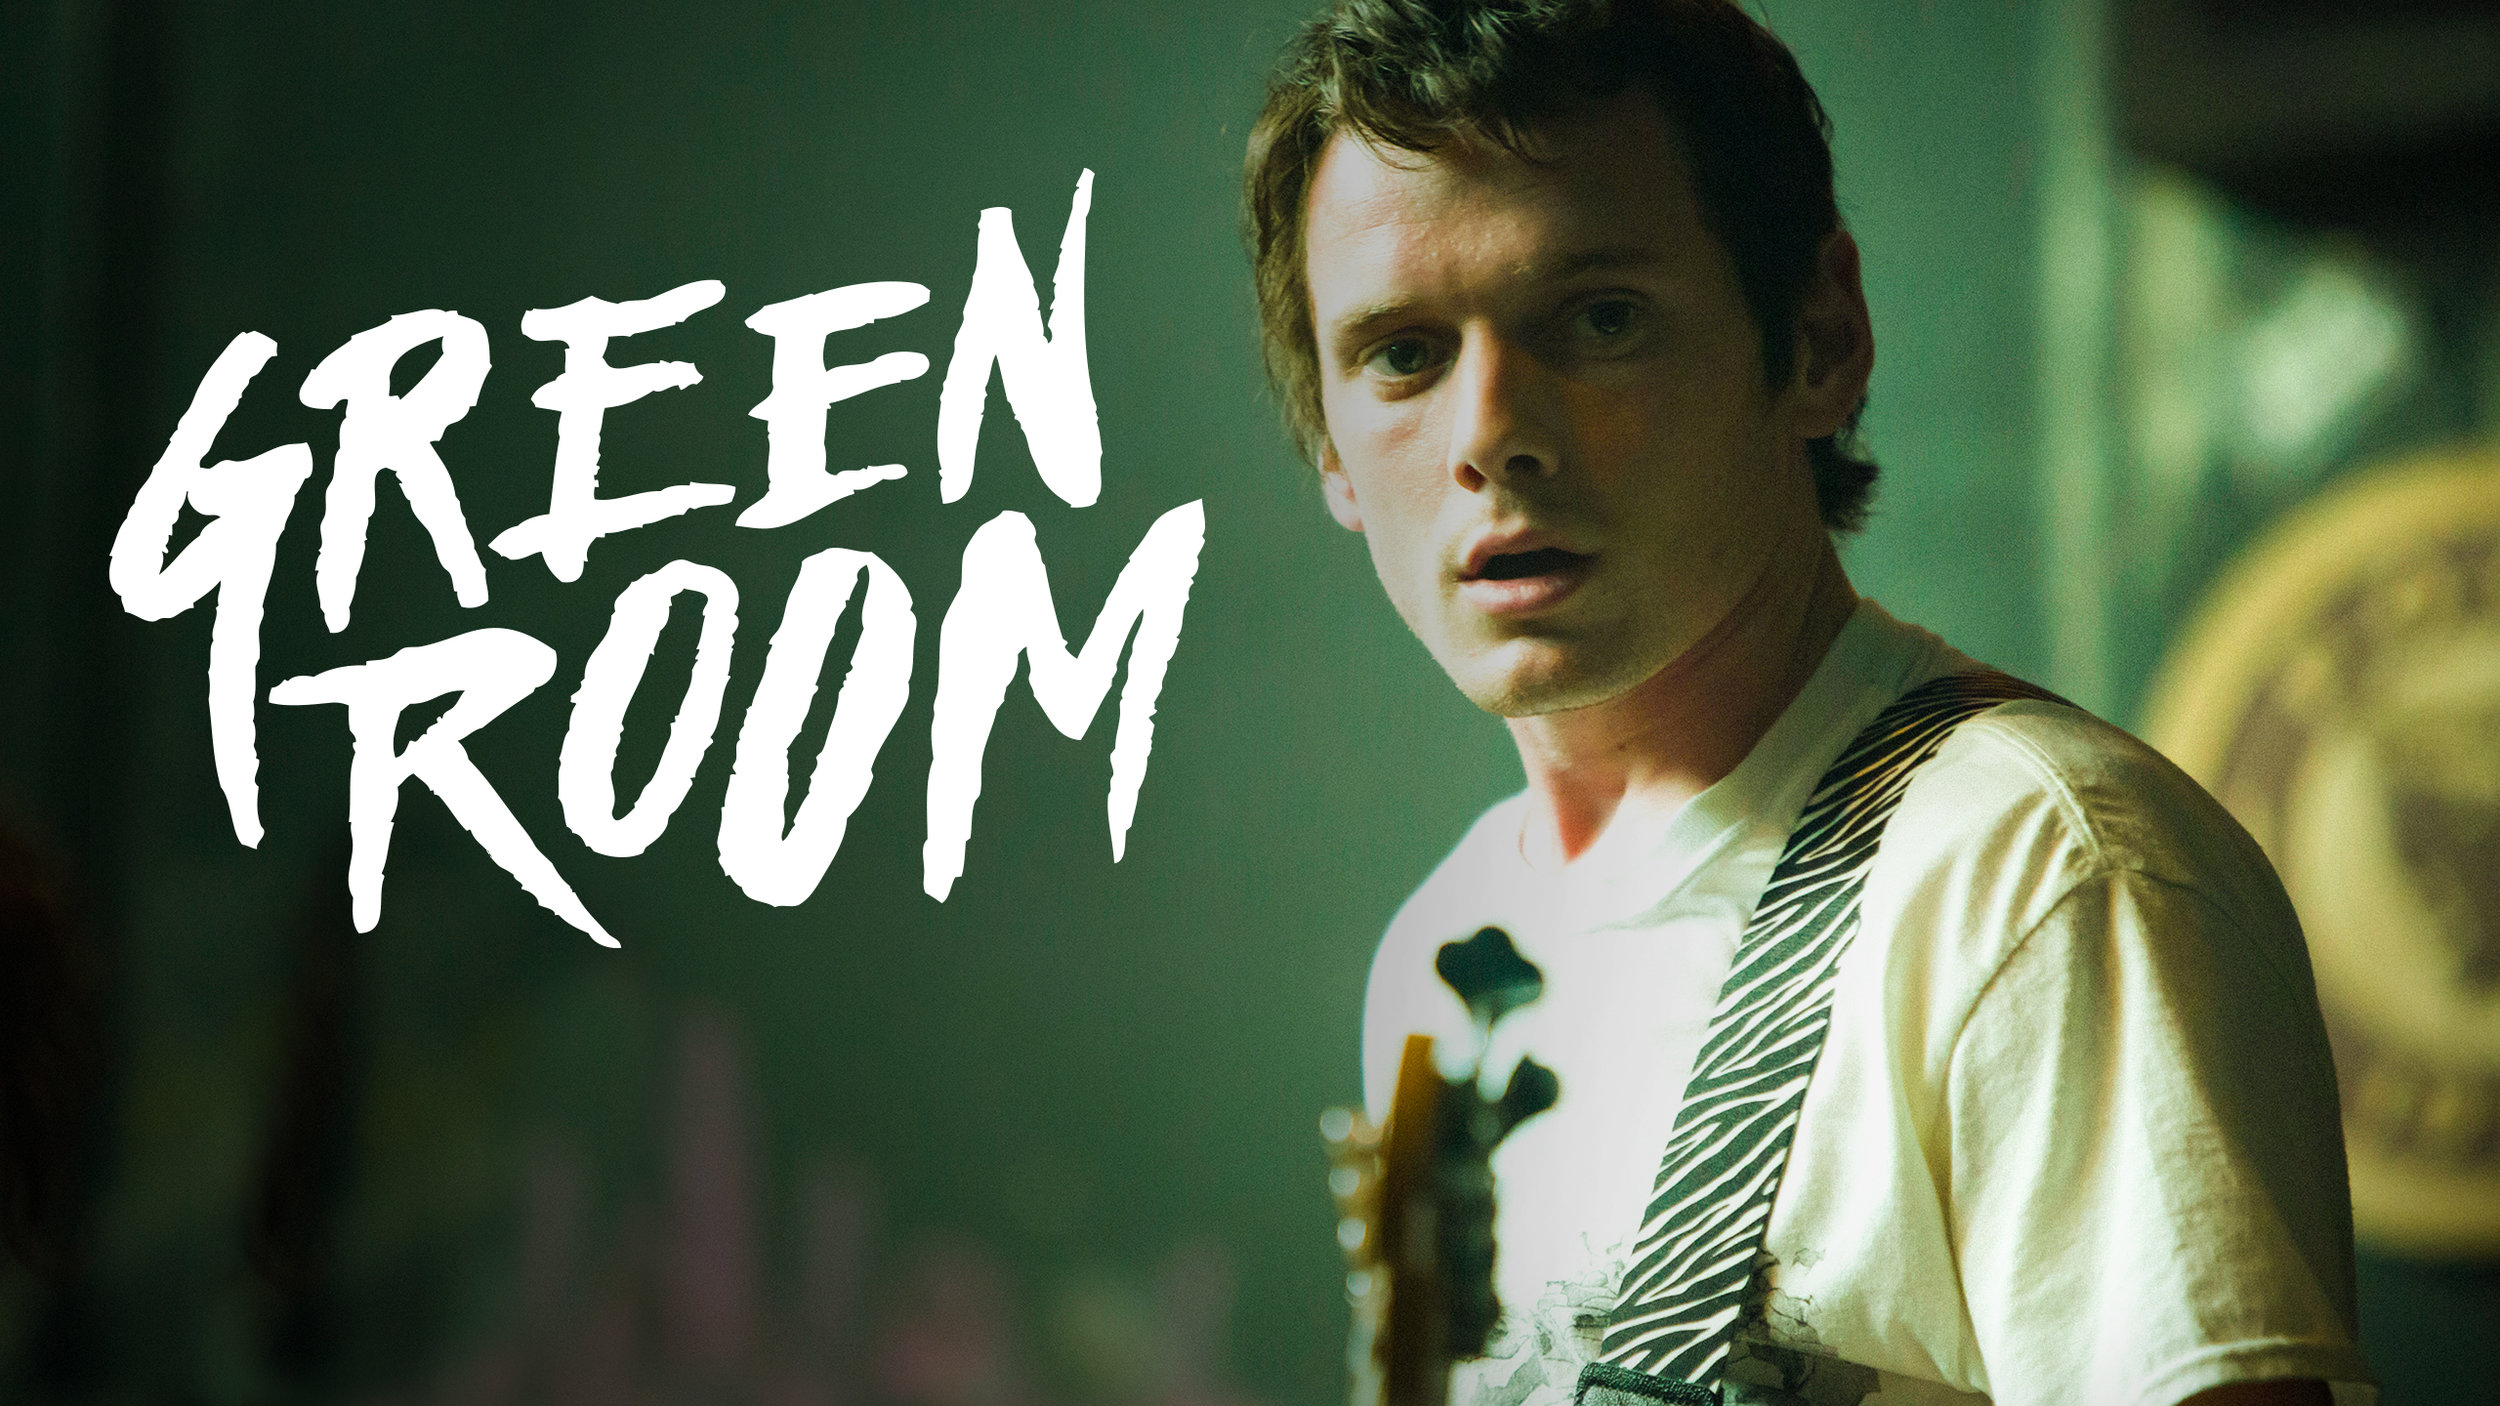 Green Room_Horizontal3.jpg